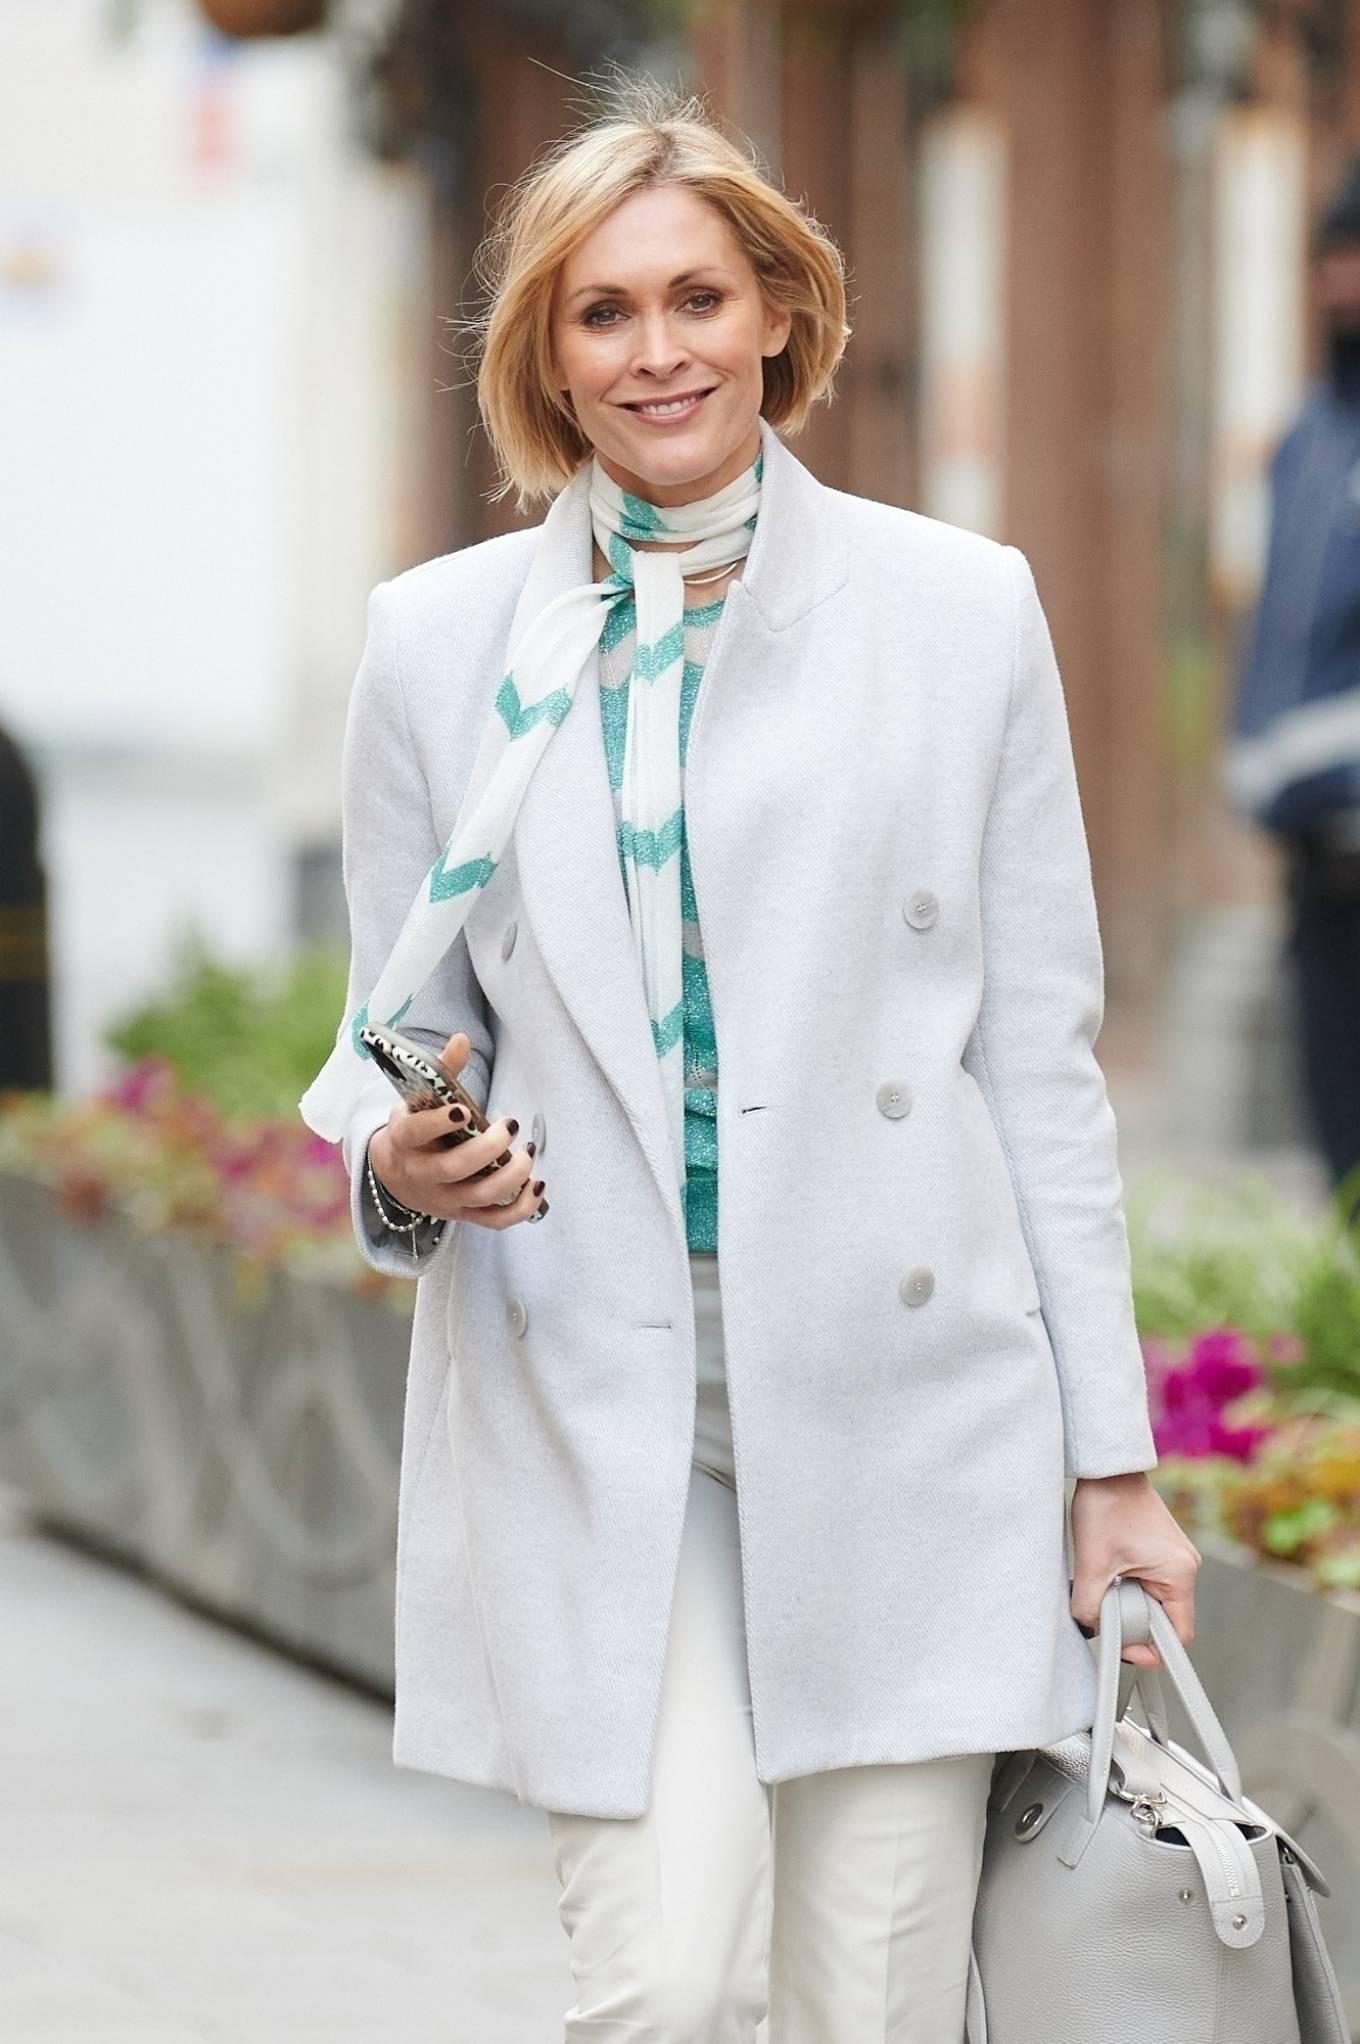 Jenni Falconer - Pictured leaving Global Radio in London